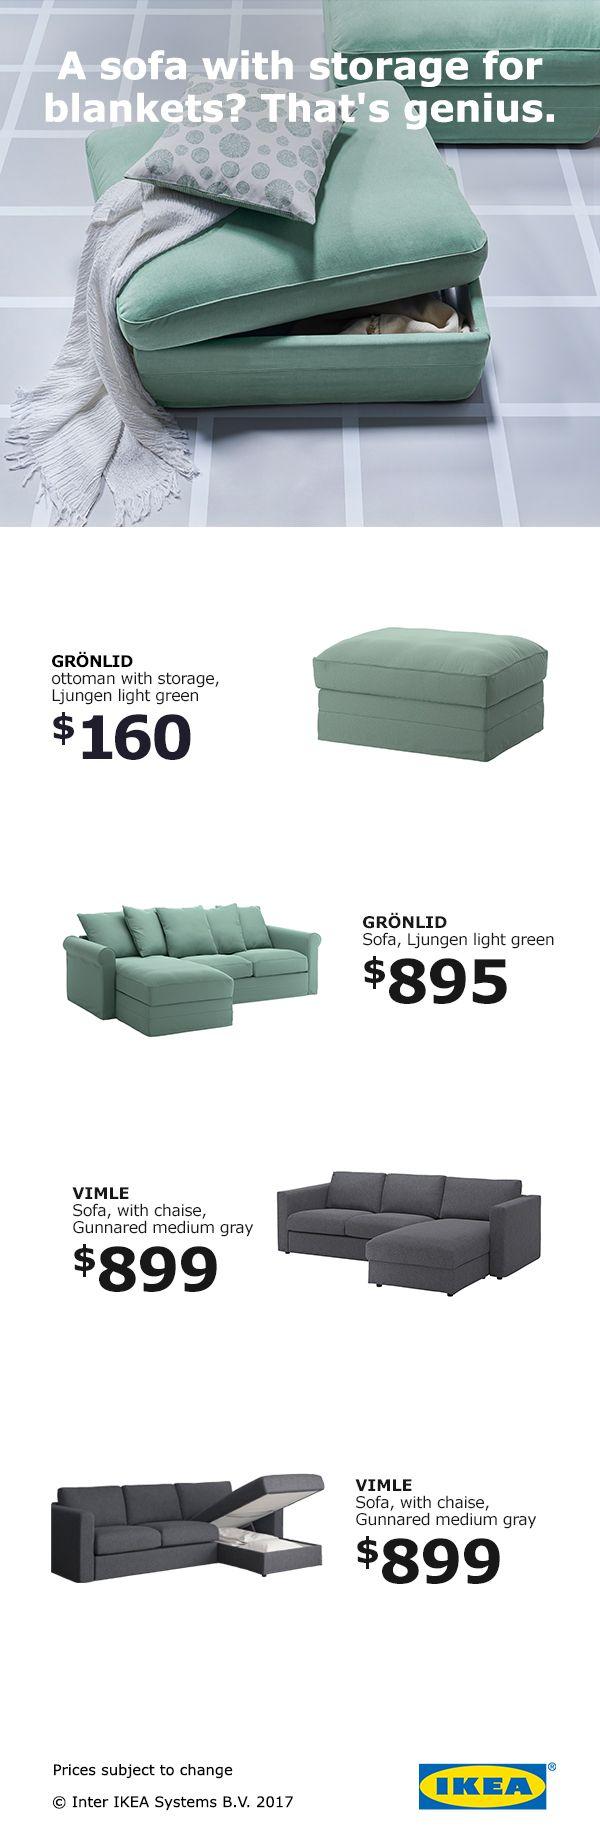 Grönlid And Were Series Comfortable CustomizableThe Vimle JcuK1FTl3